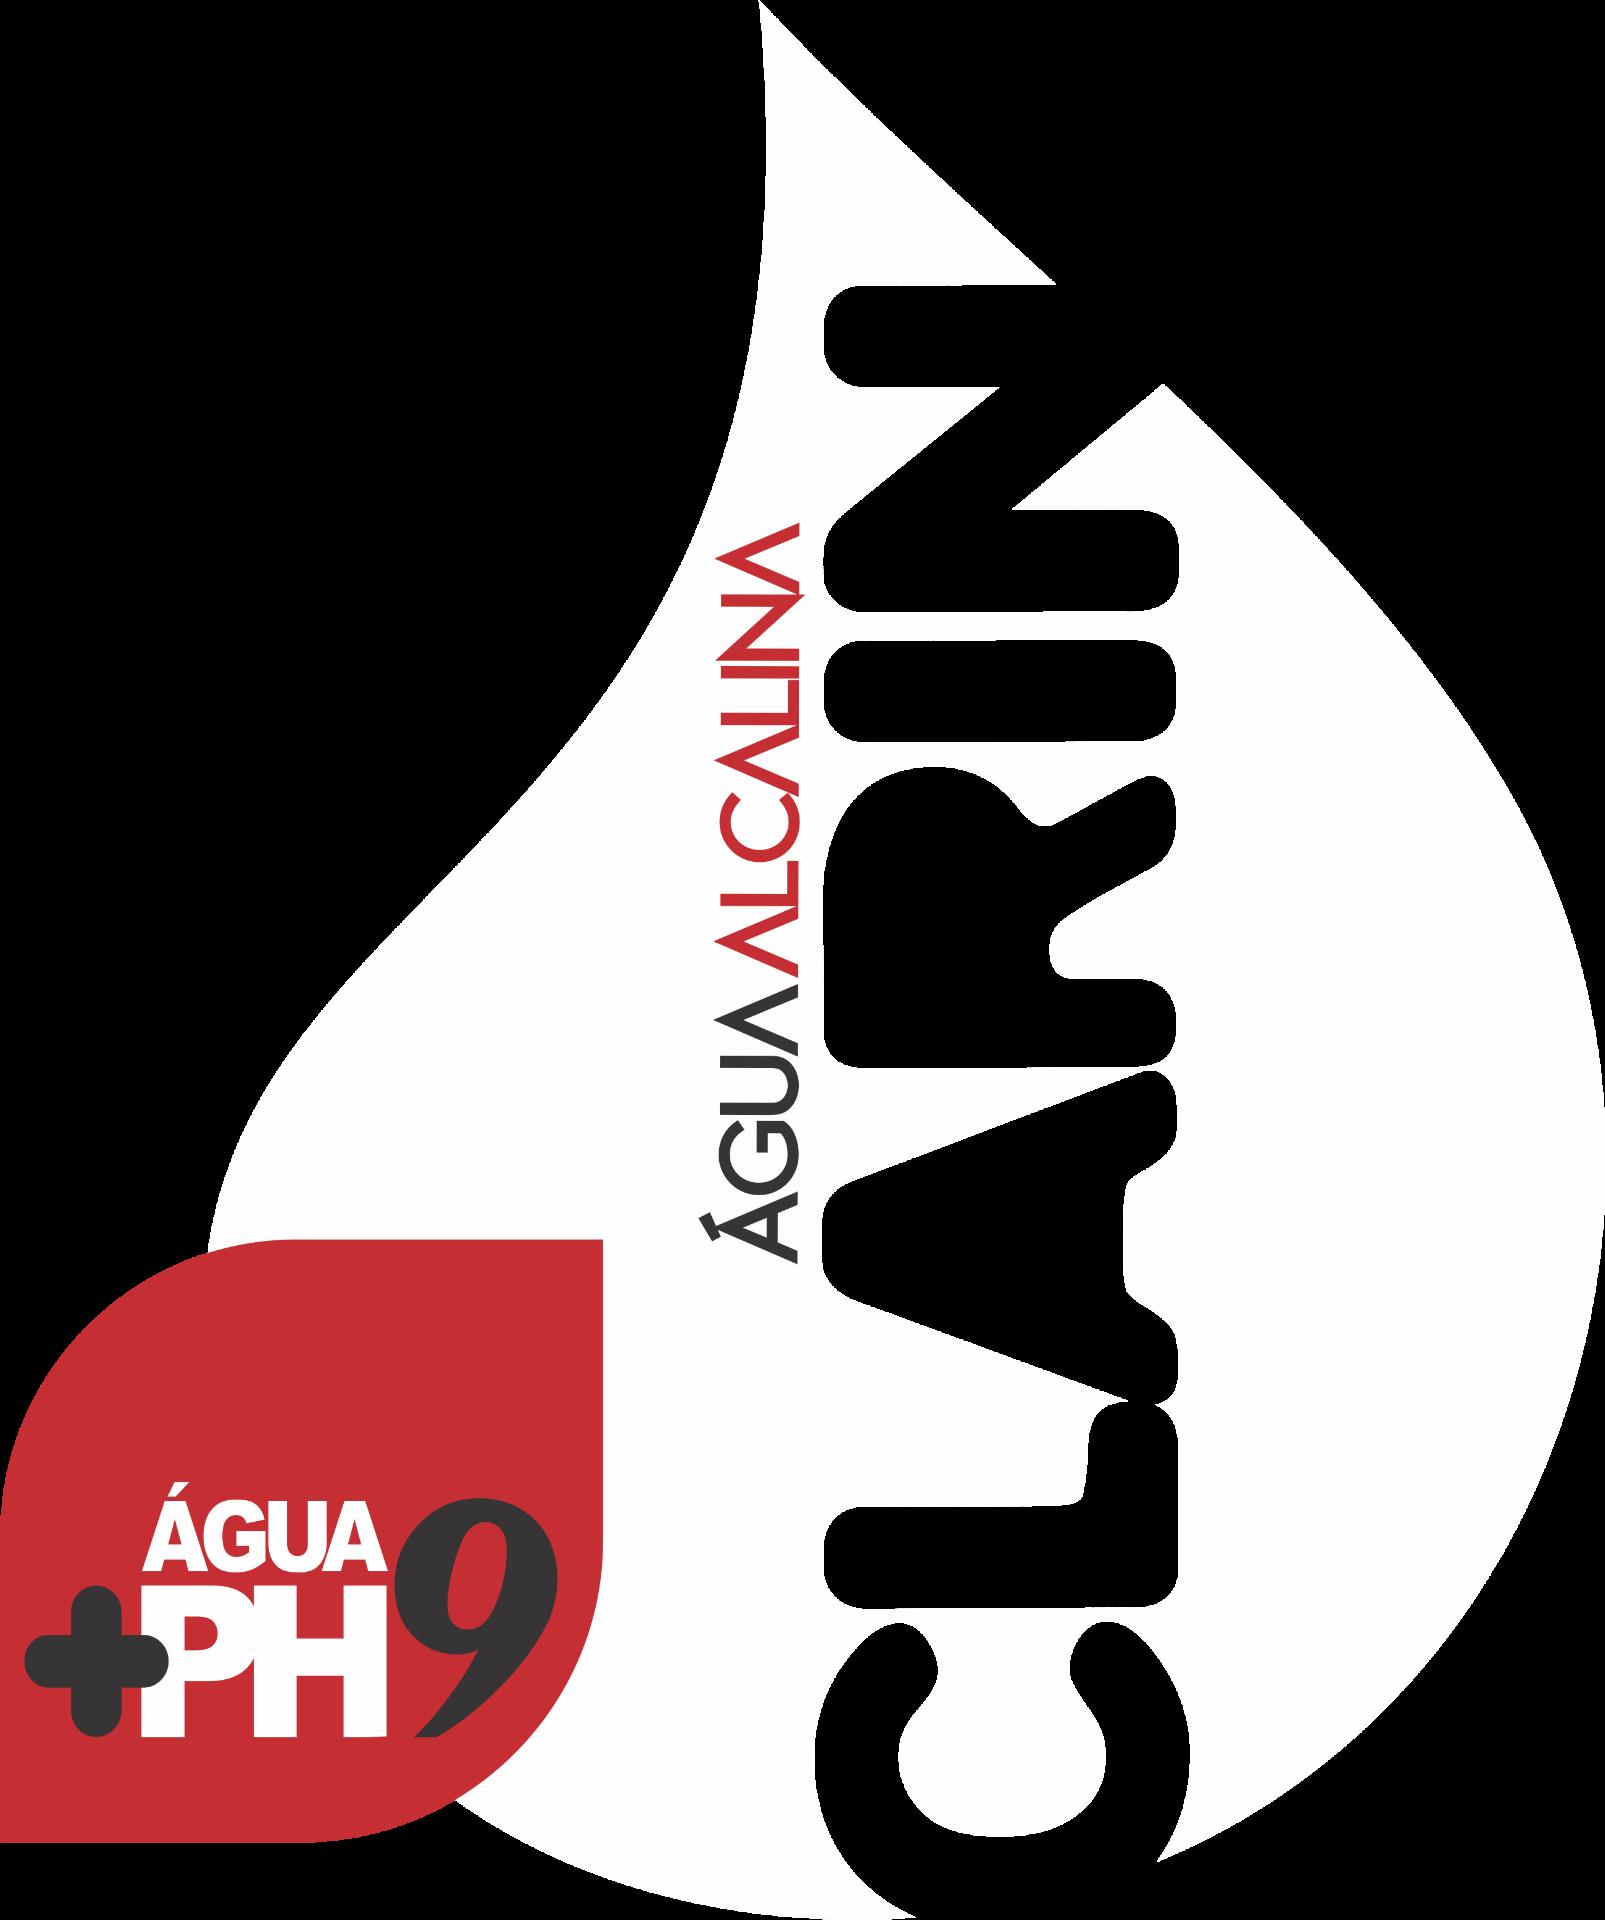 ÁGUA ALCALINA CLARIN